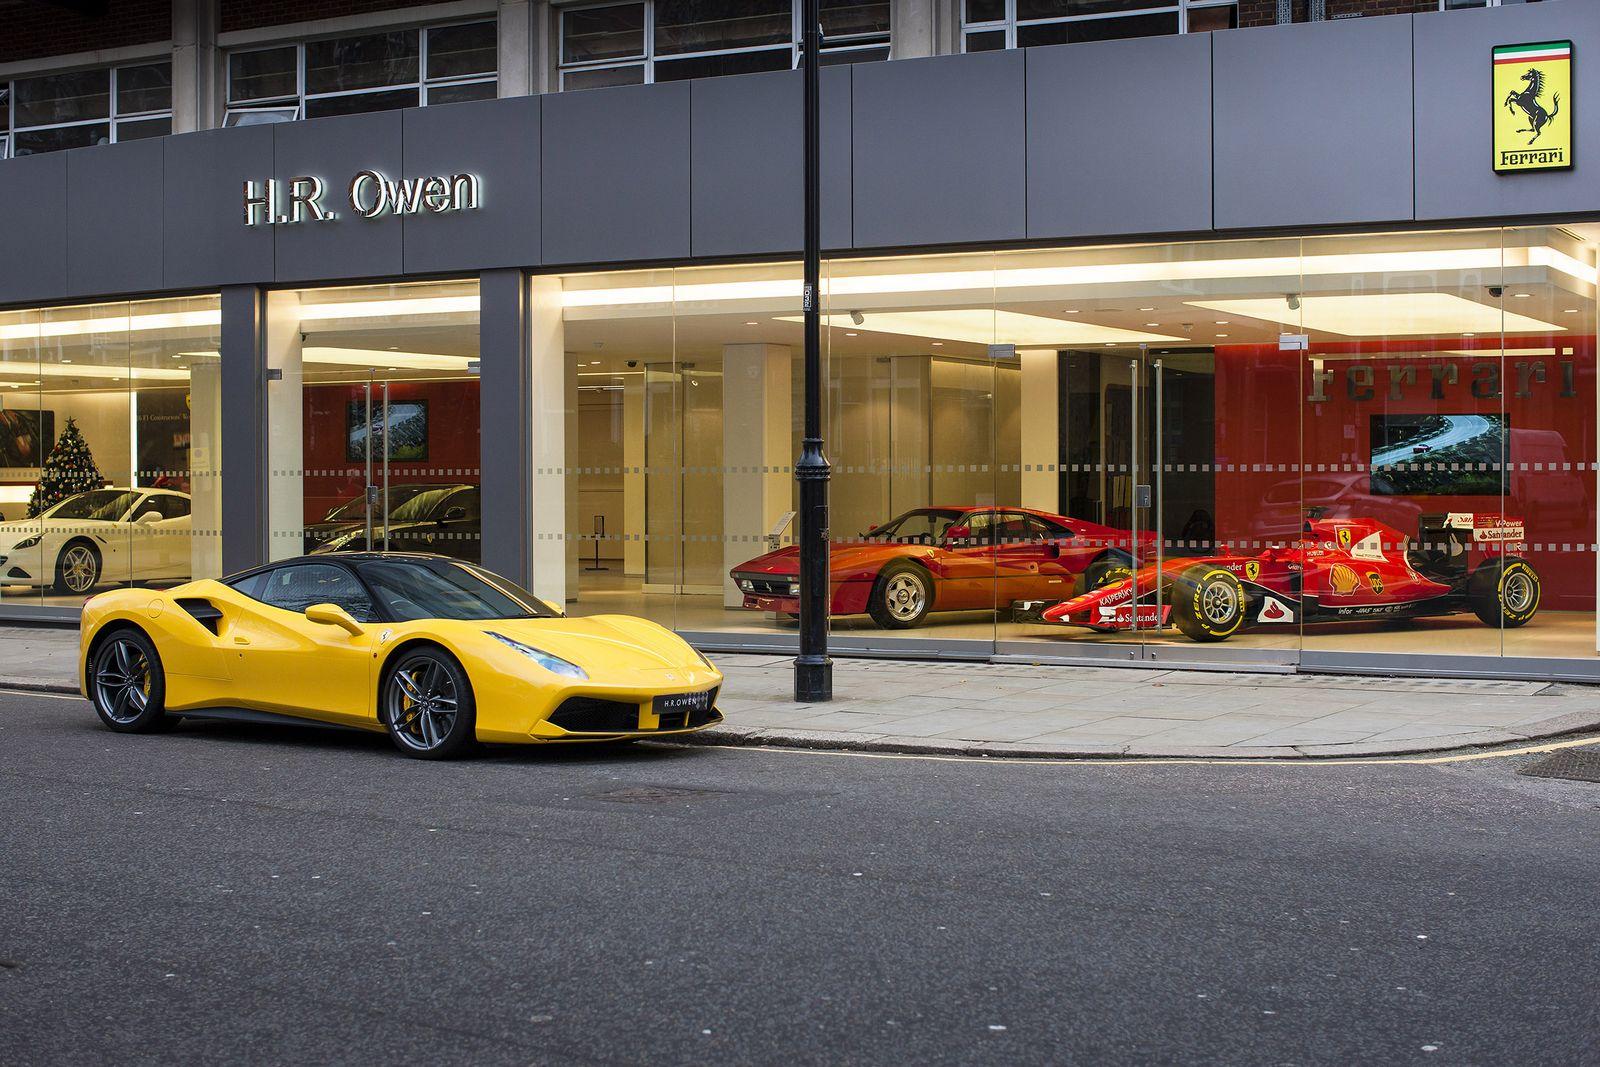 Ferrari Dealership Named World S Best Gets 2015 F1 Car